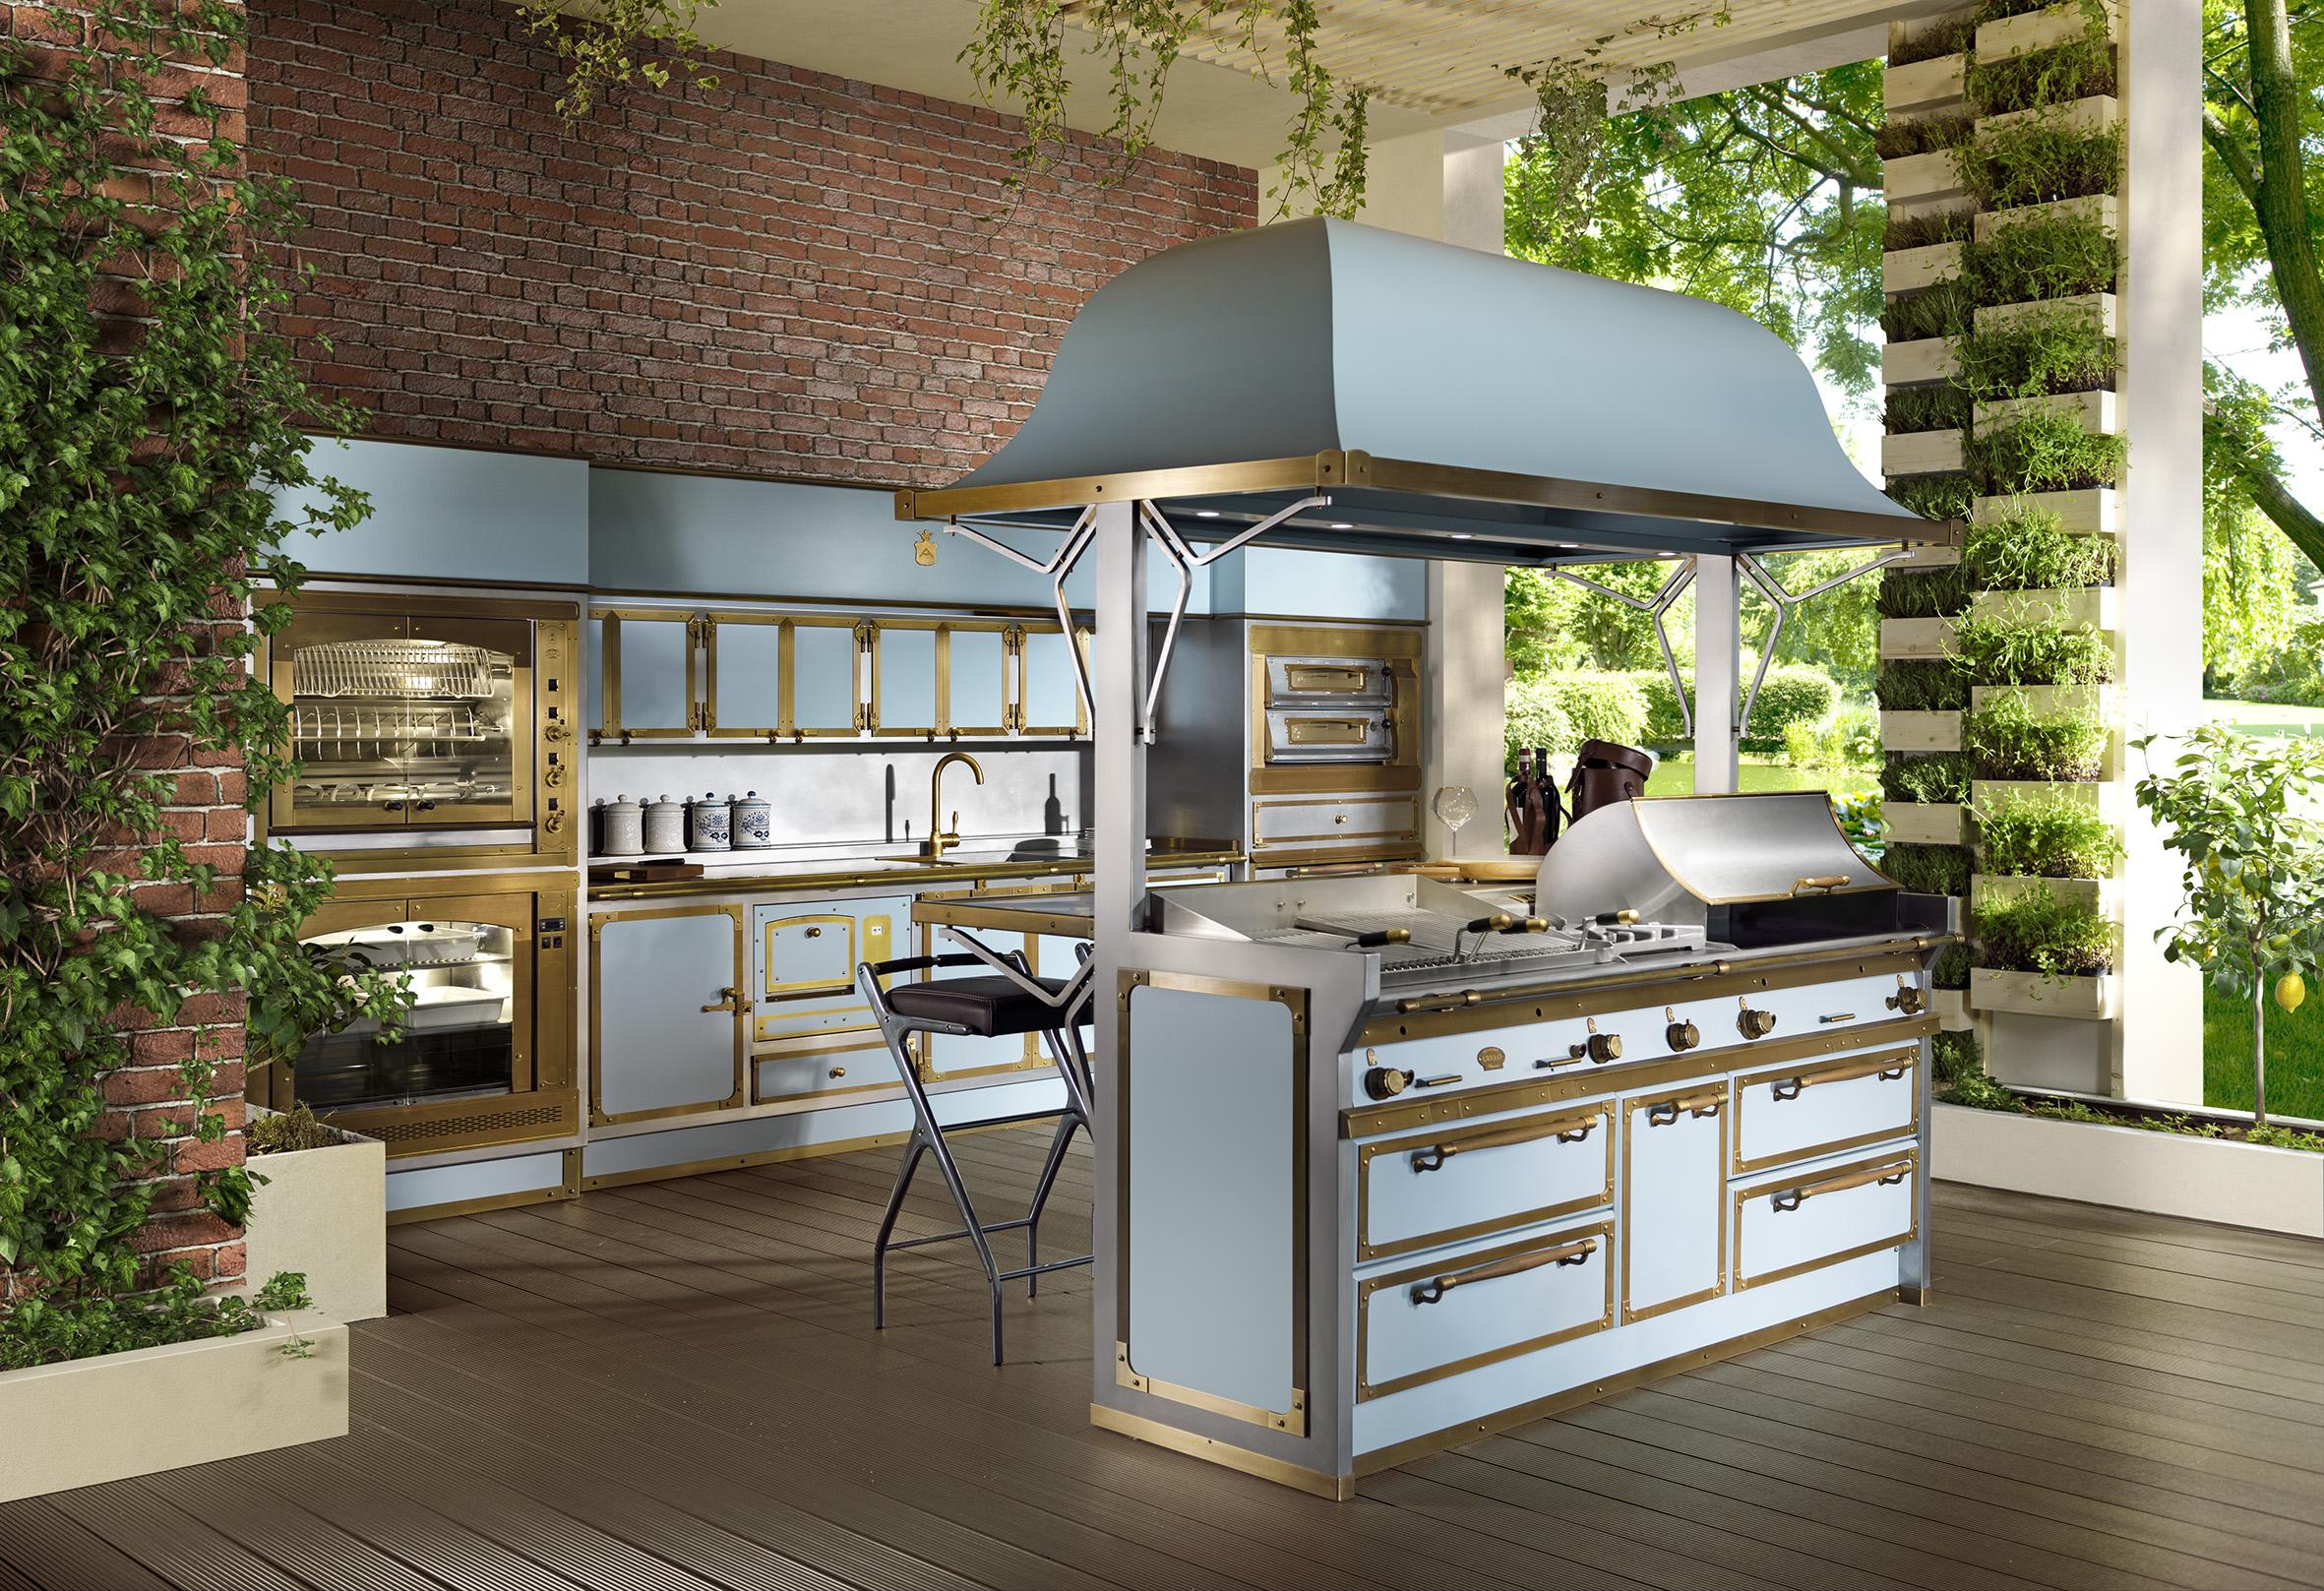 New spring summer collection kitchens virtual tour for Virtual tour kitchen designs